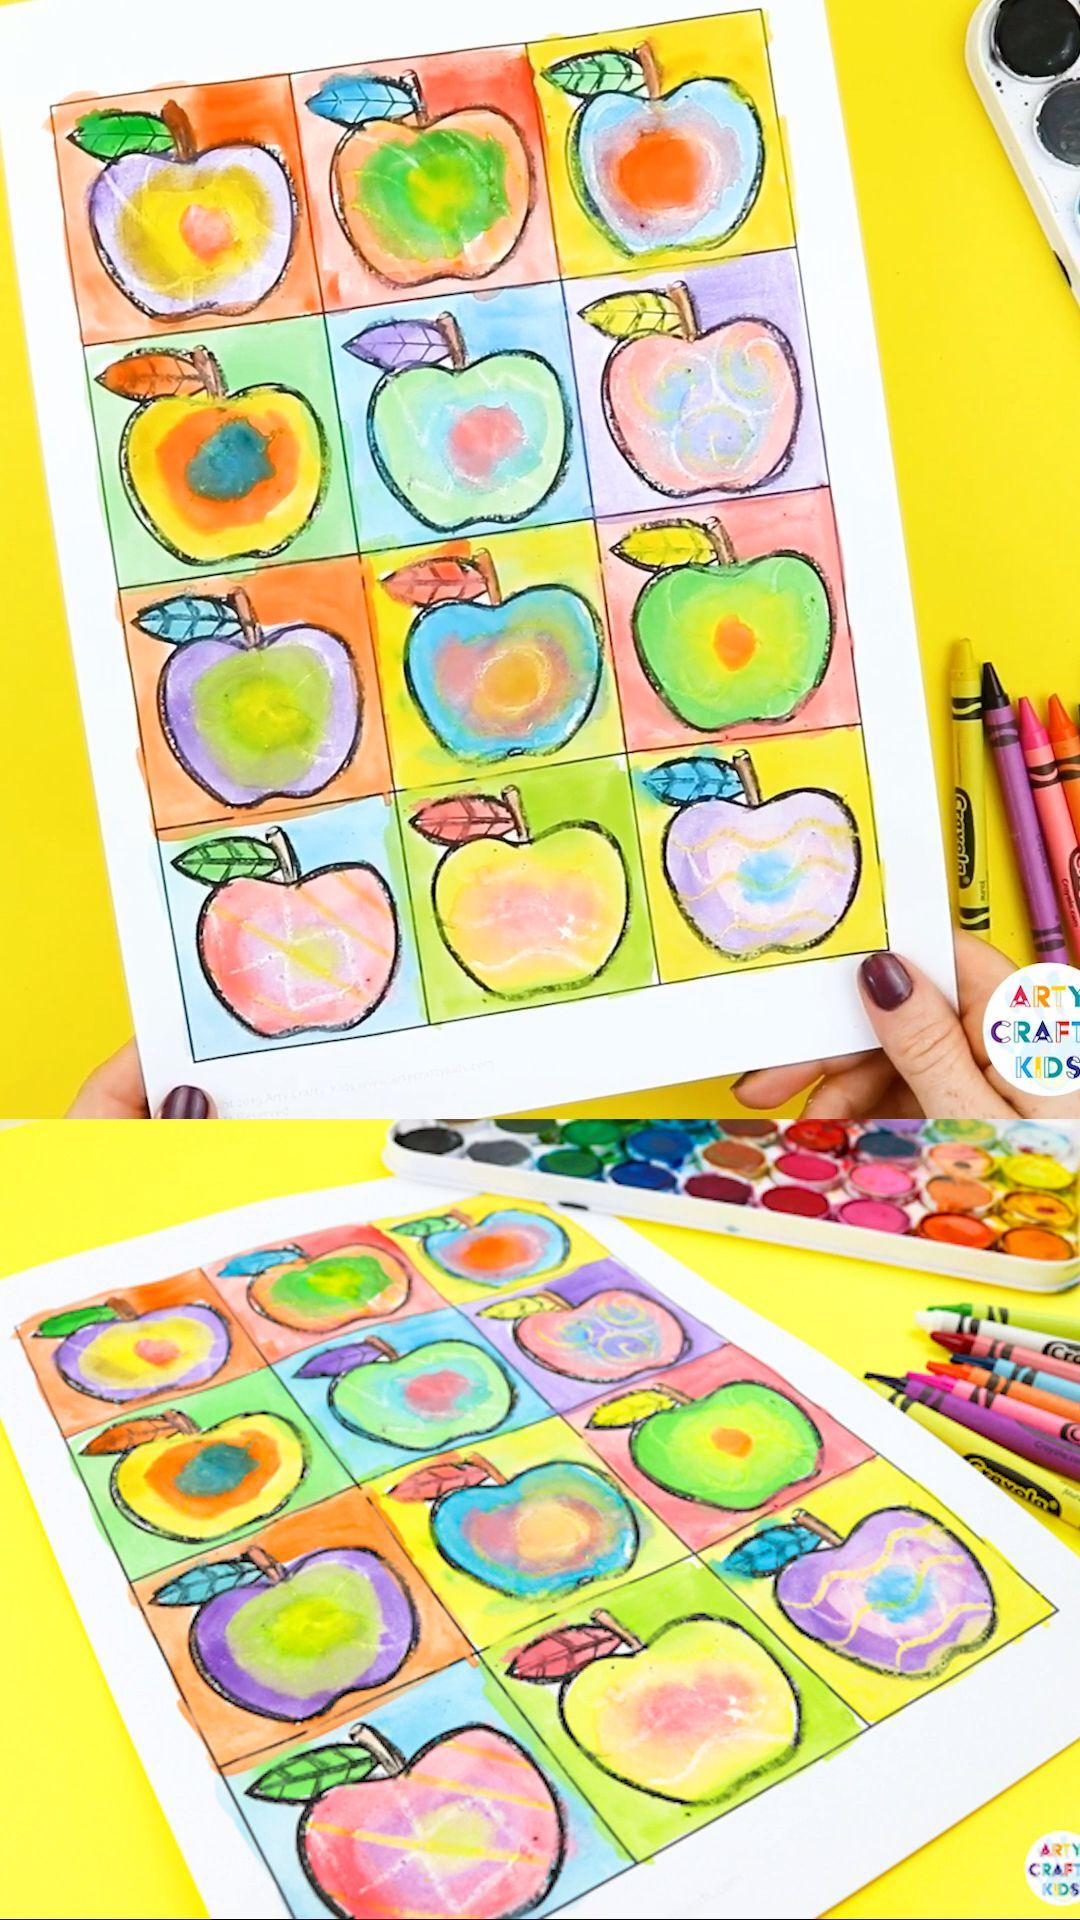 Photo of Kandinsky Inspired Apple Art   Arty Crafty Kids